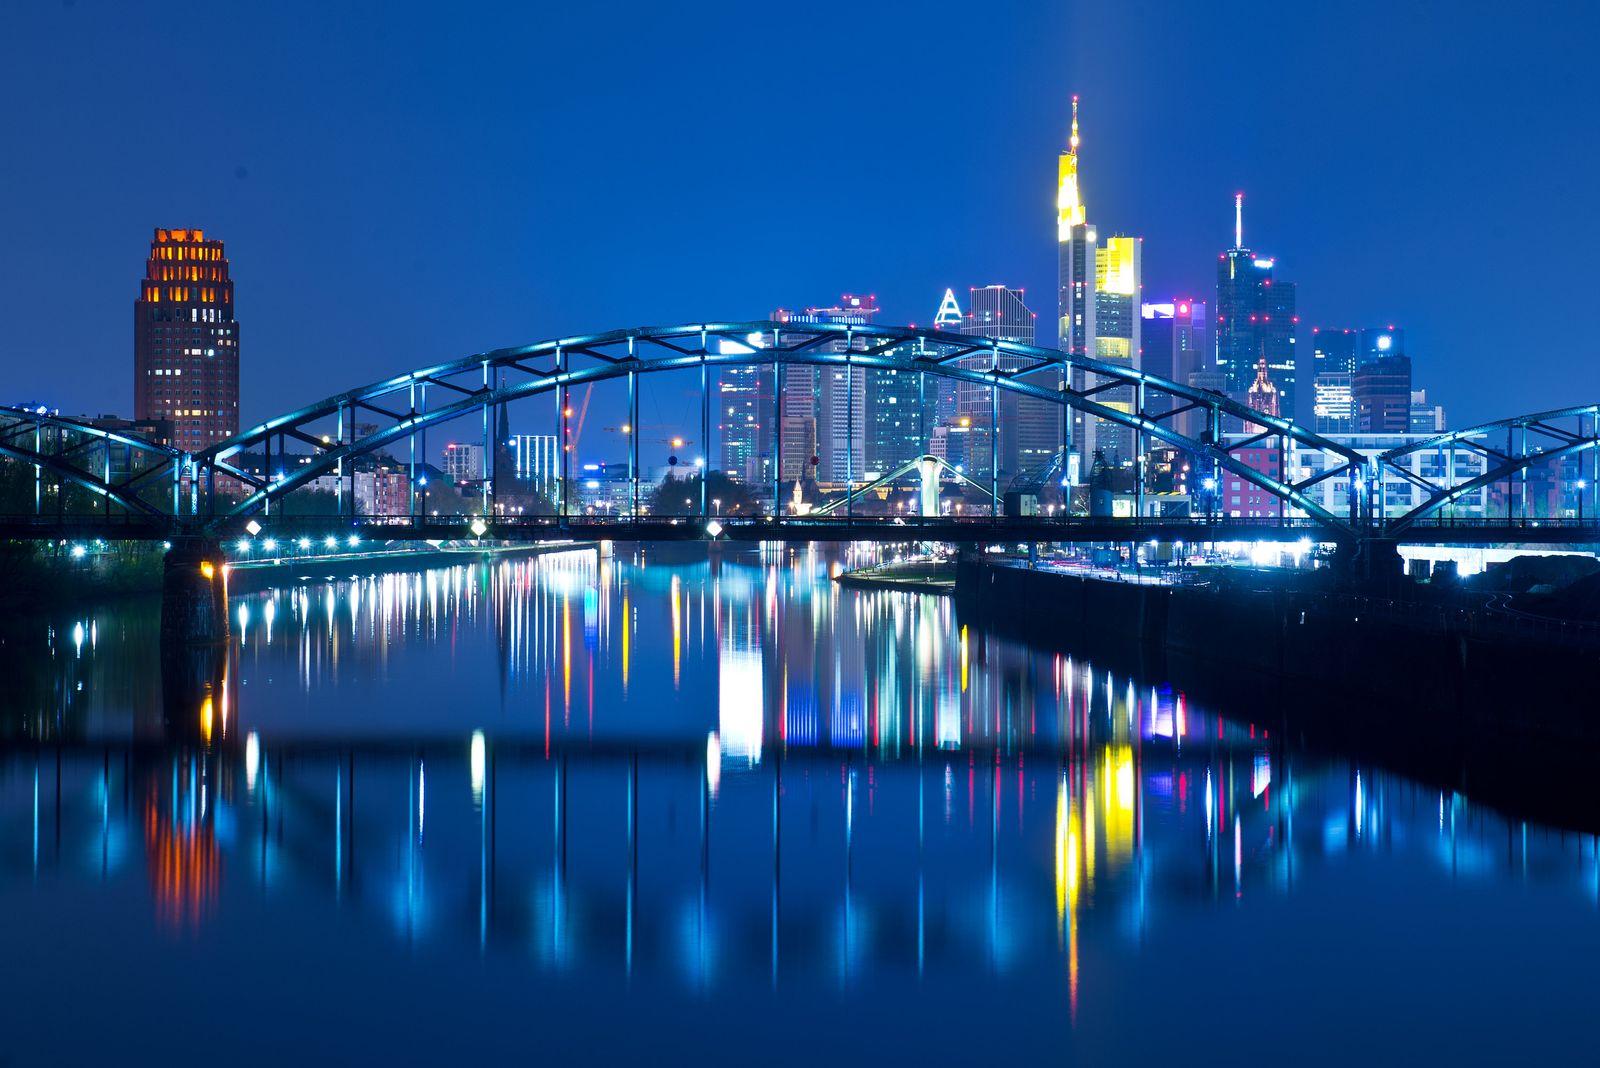 Luminale 2014 Frankfurter Skyline